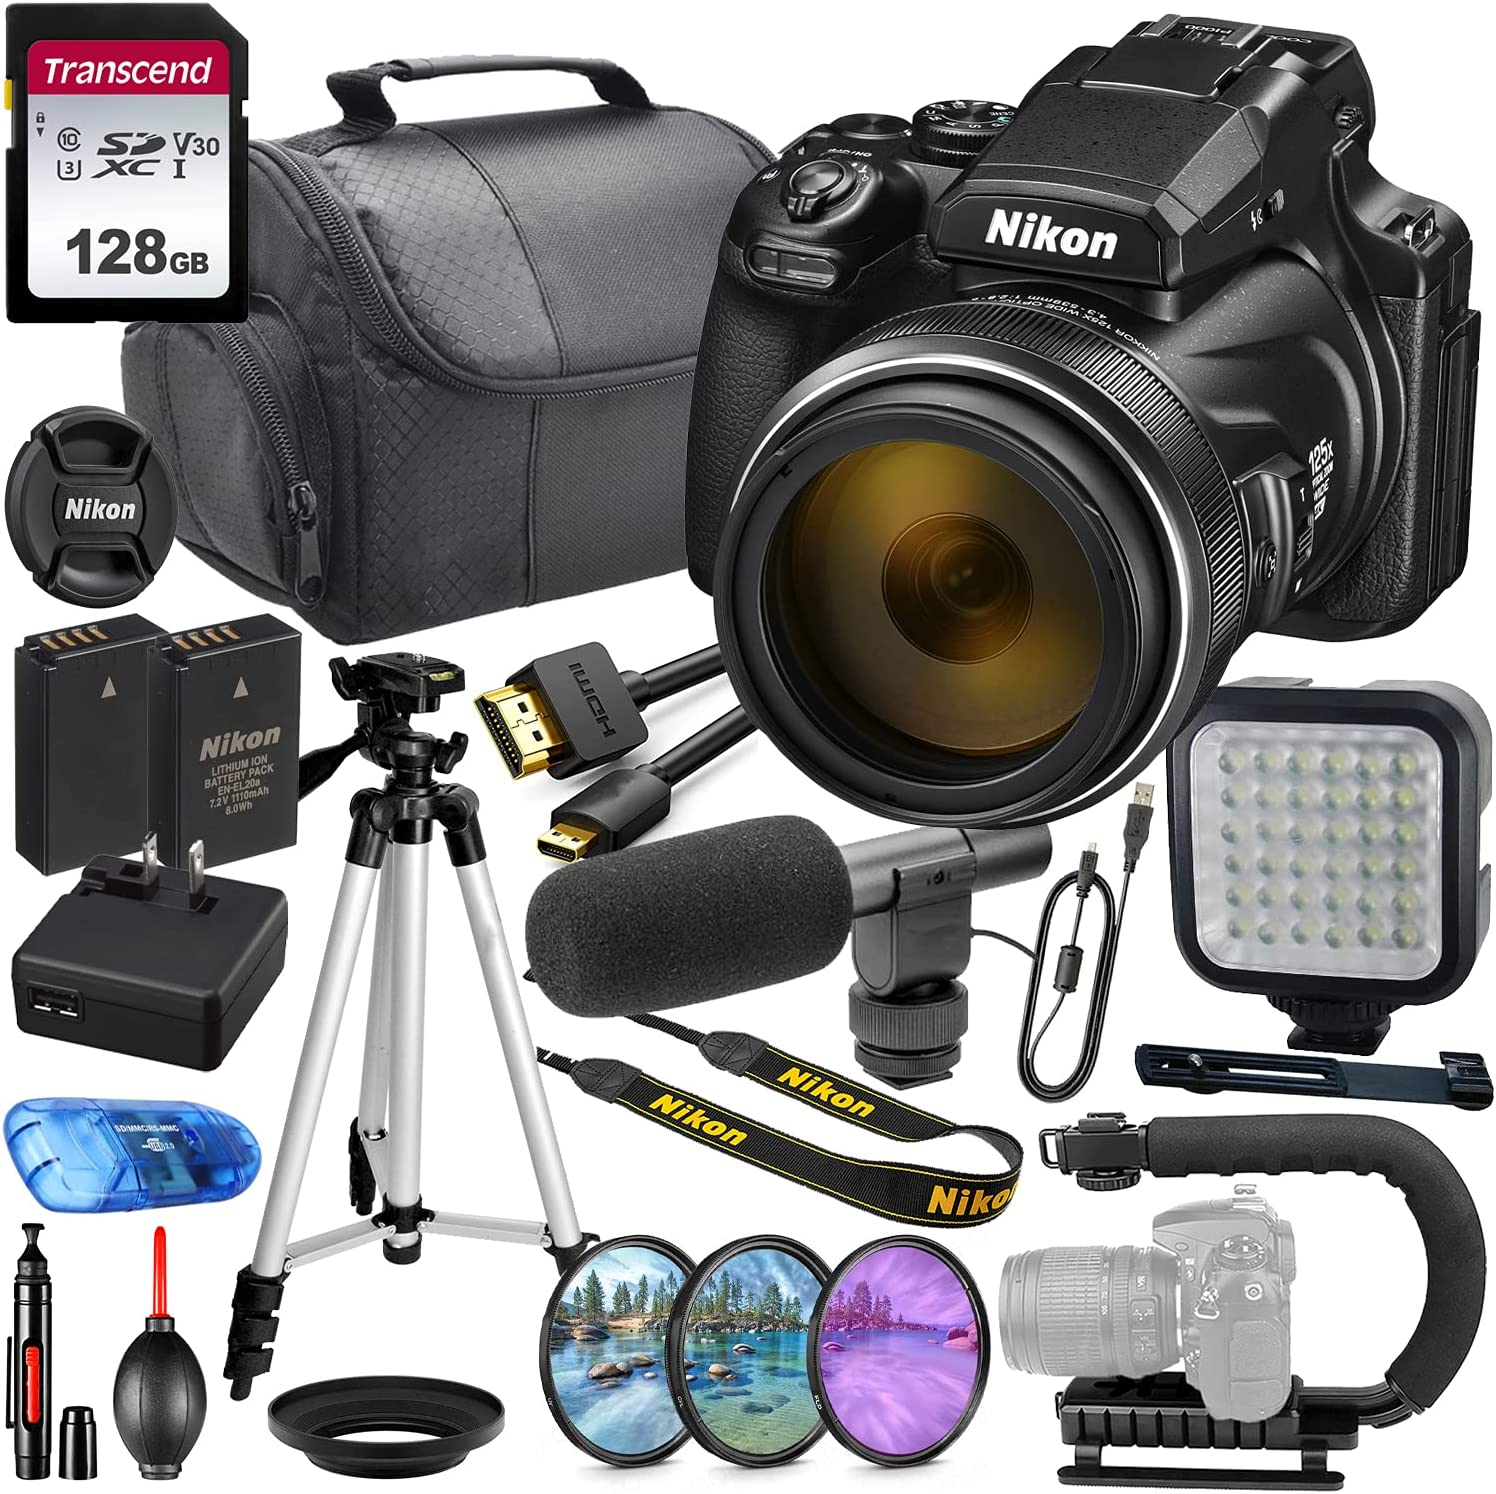 Nikon COOLPIX P1000 Digital Ranking TOP20 Camera 2021 new #26522 Making Video Bundl MFR